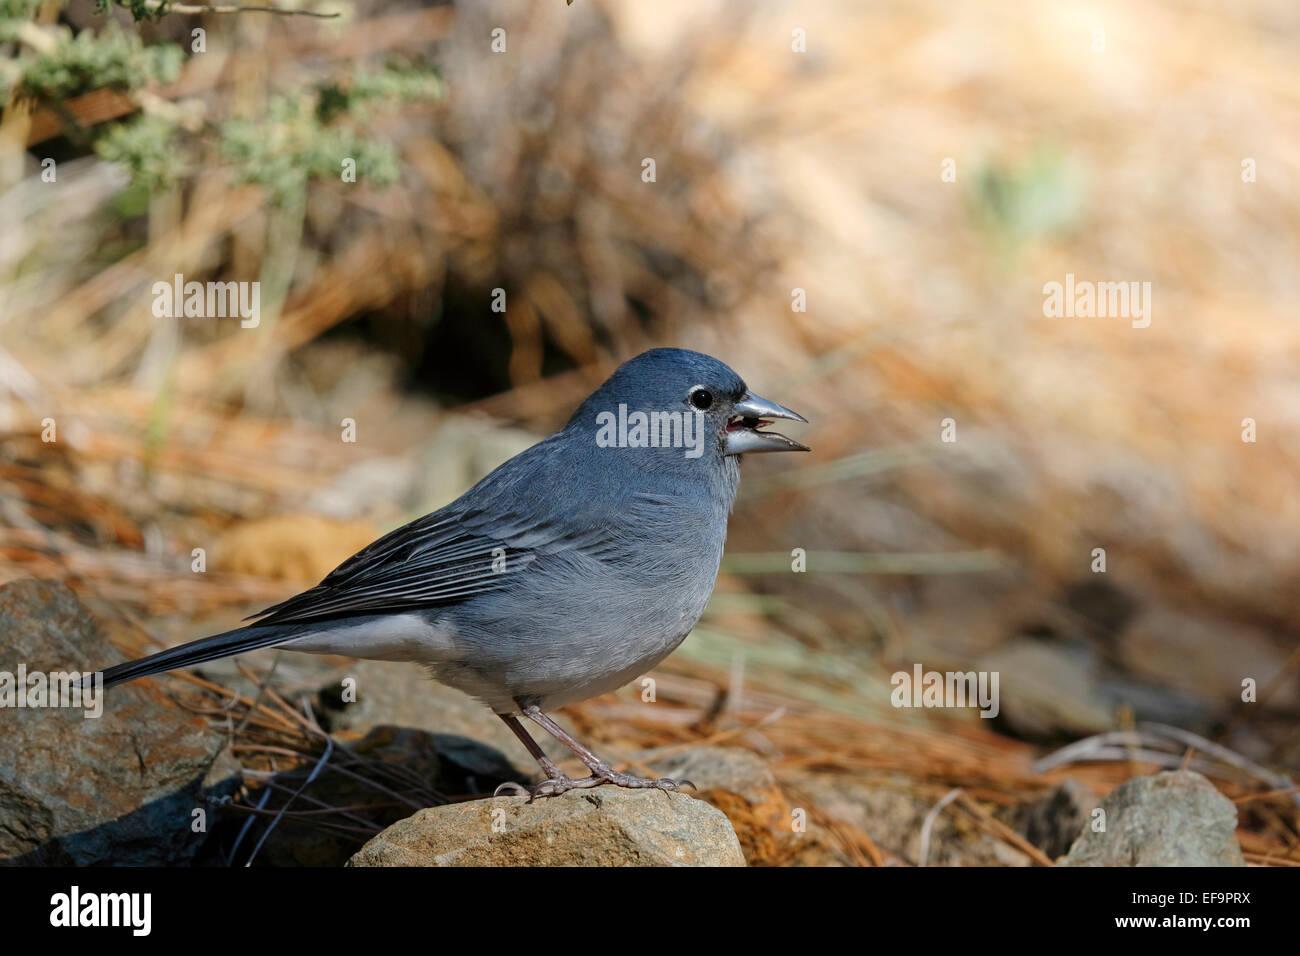 Blue Chaffinch, (Fringilla teydea teydea), male on the ground, Tenerife - Stock Image